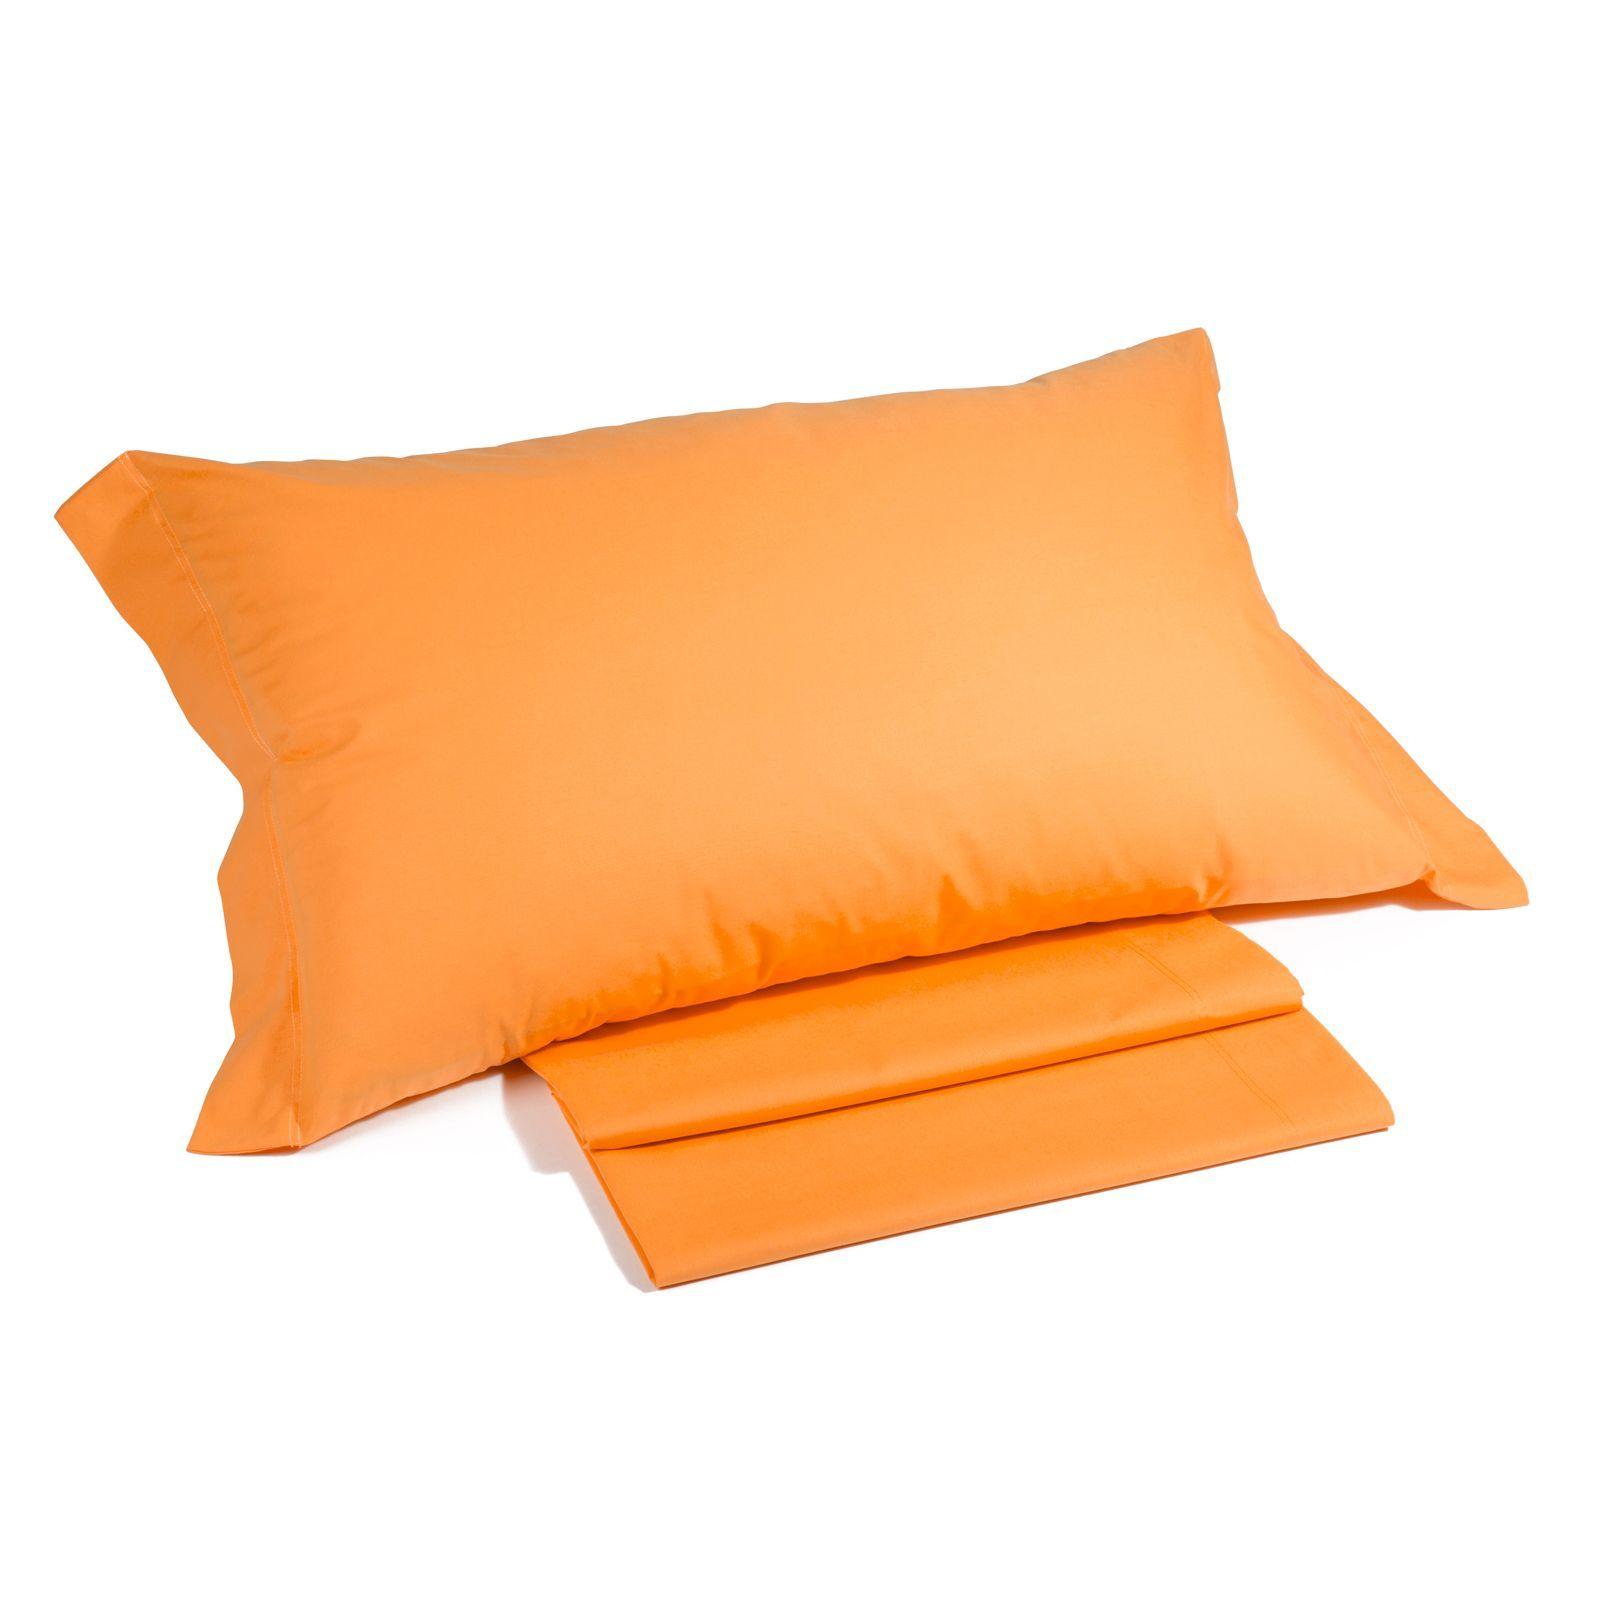 Для сна Наволочки 2шт 70х70 Caleffi Tinta Unita оранжевые komplekt-navolochek-caleffi-tinta-unita-oranzhevyy-italiya.jpg